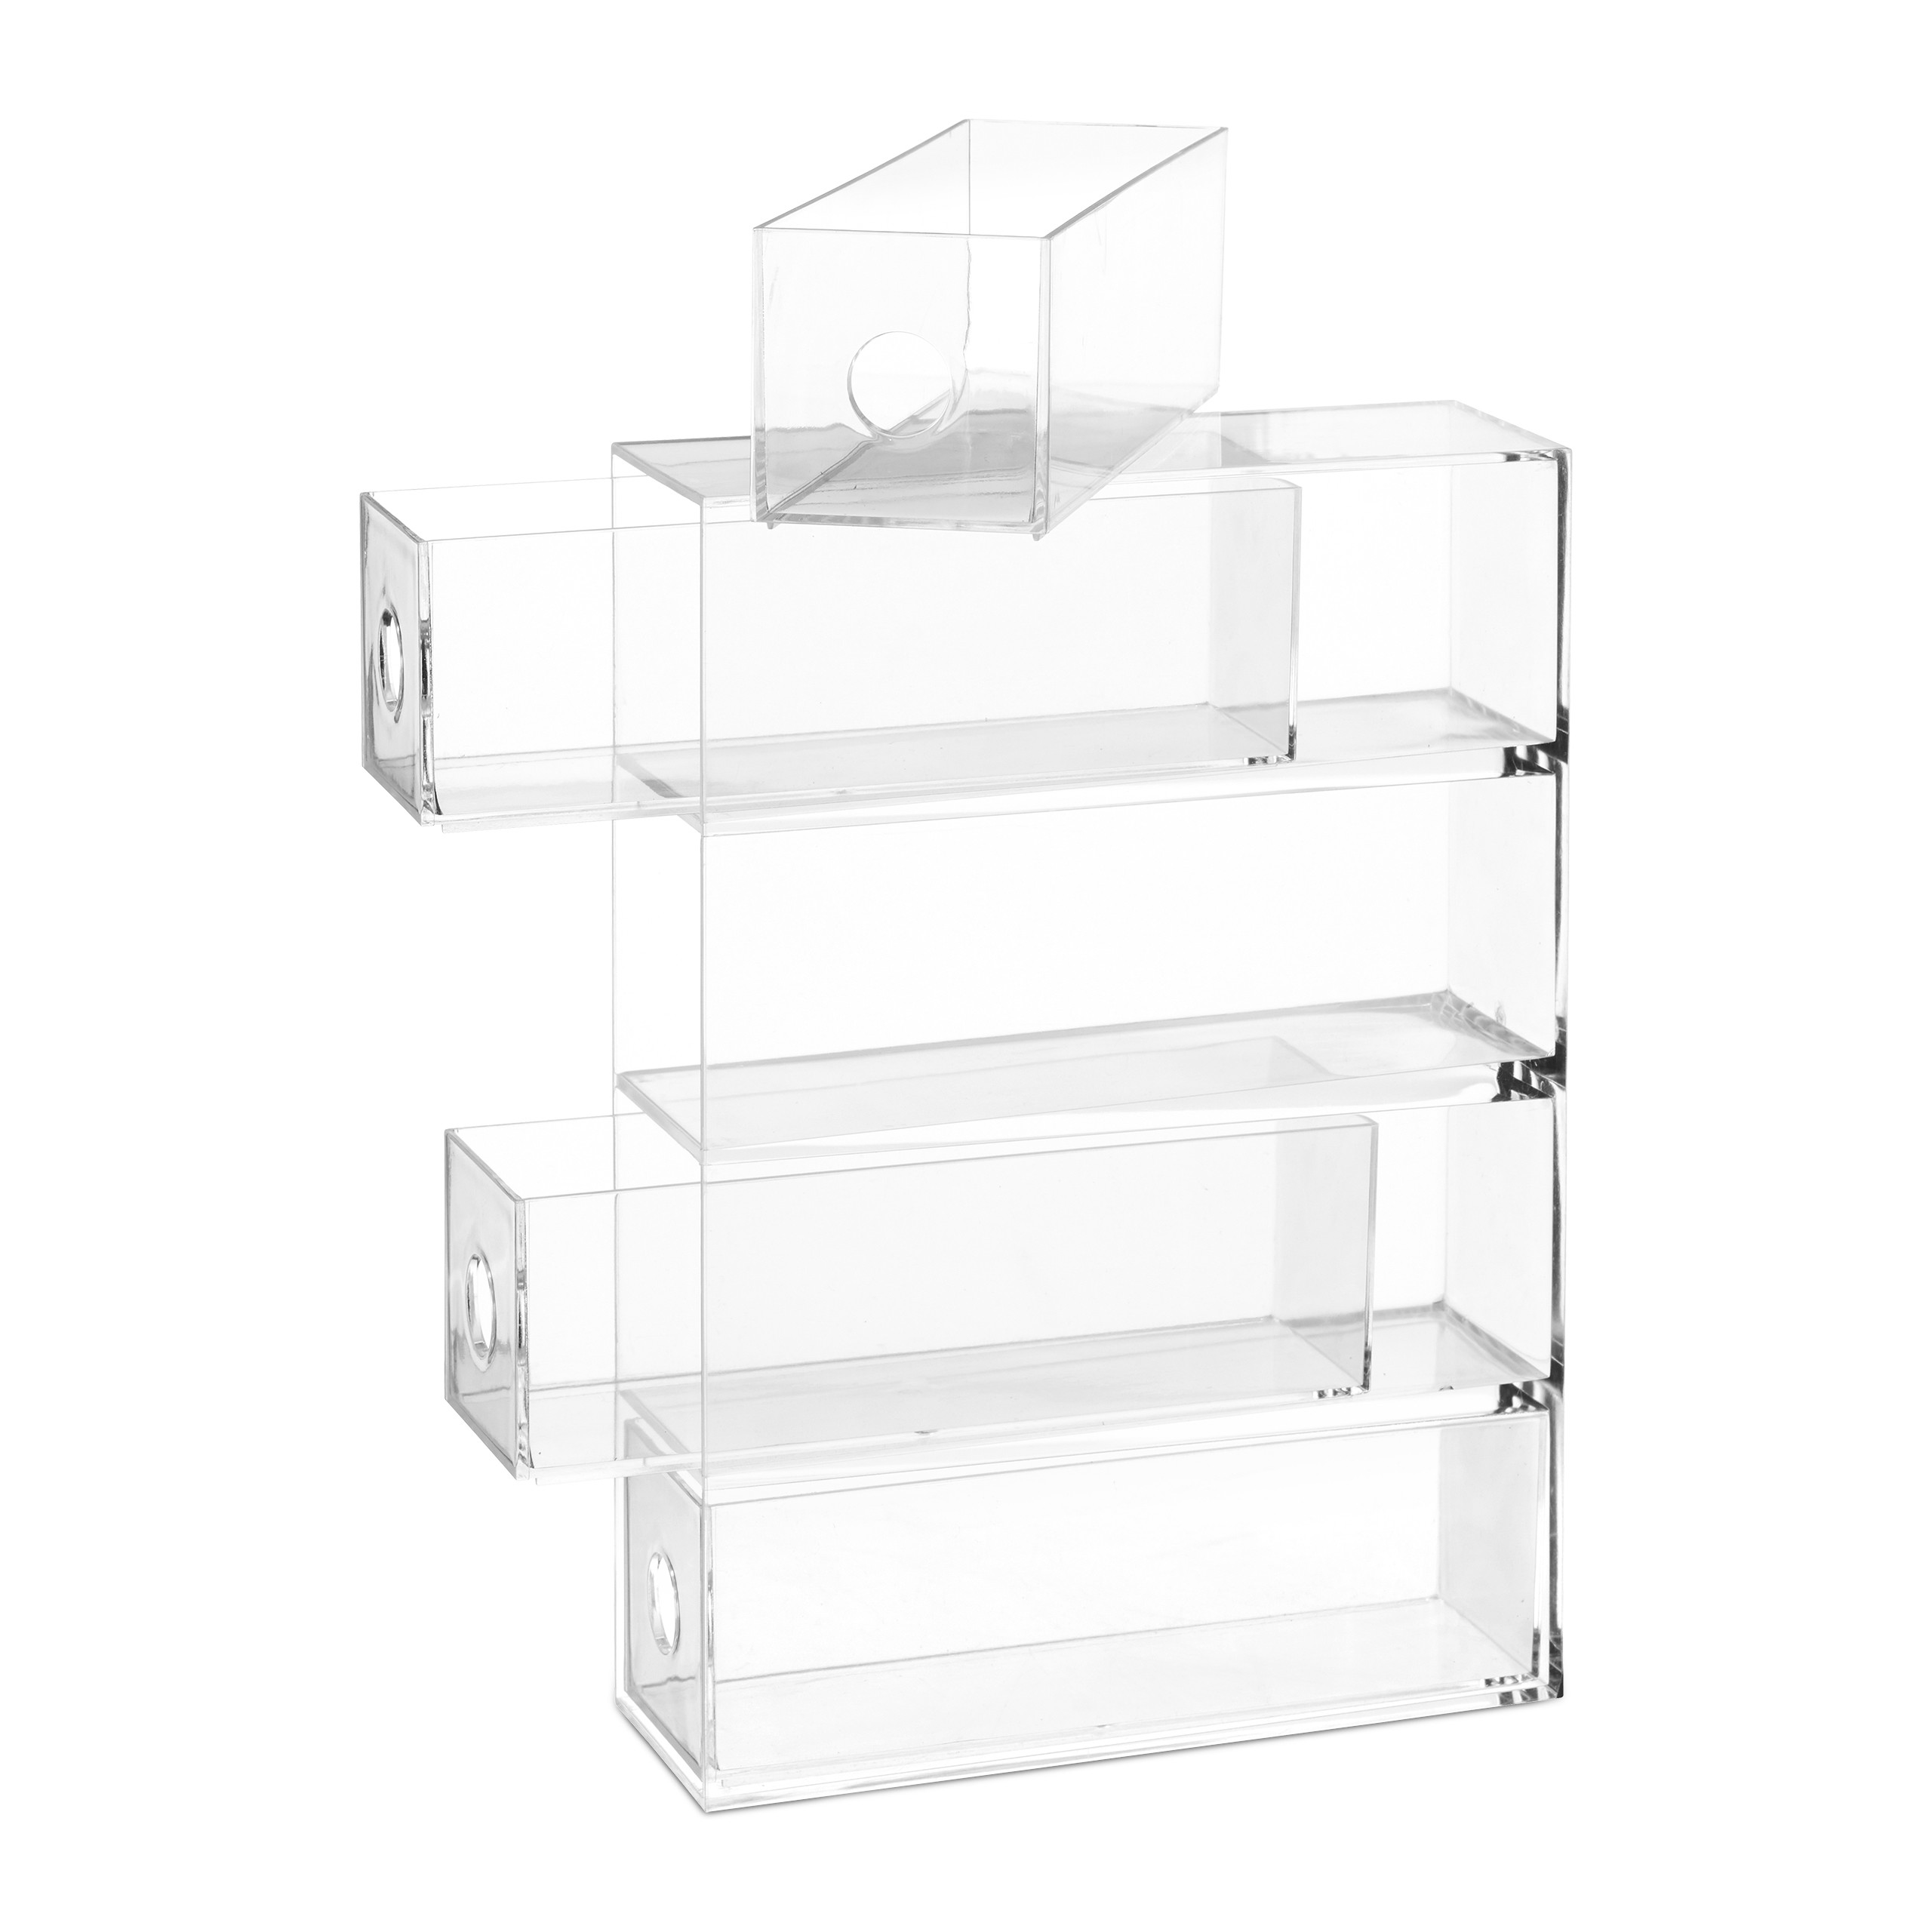 Make-Up-Organizer-Acryl-Schubladenbox-4-Schubladen-Kosmetikorganizer-transparent miniatuur 8